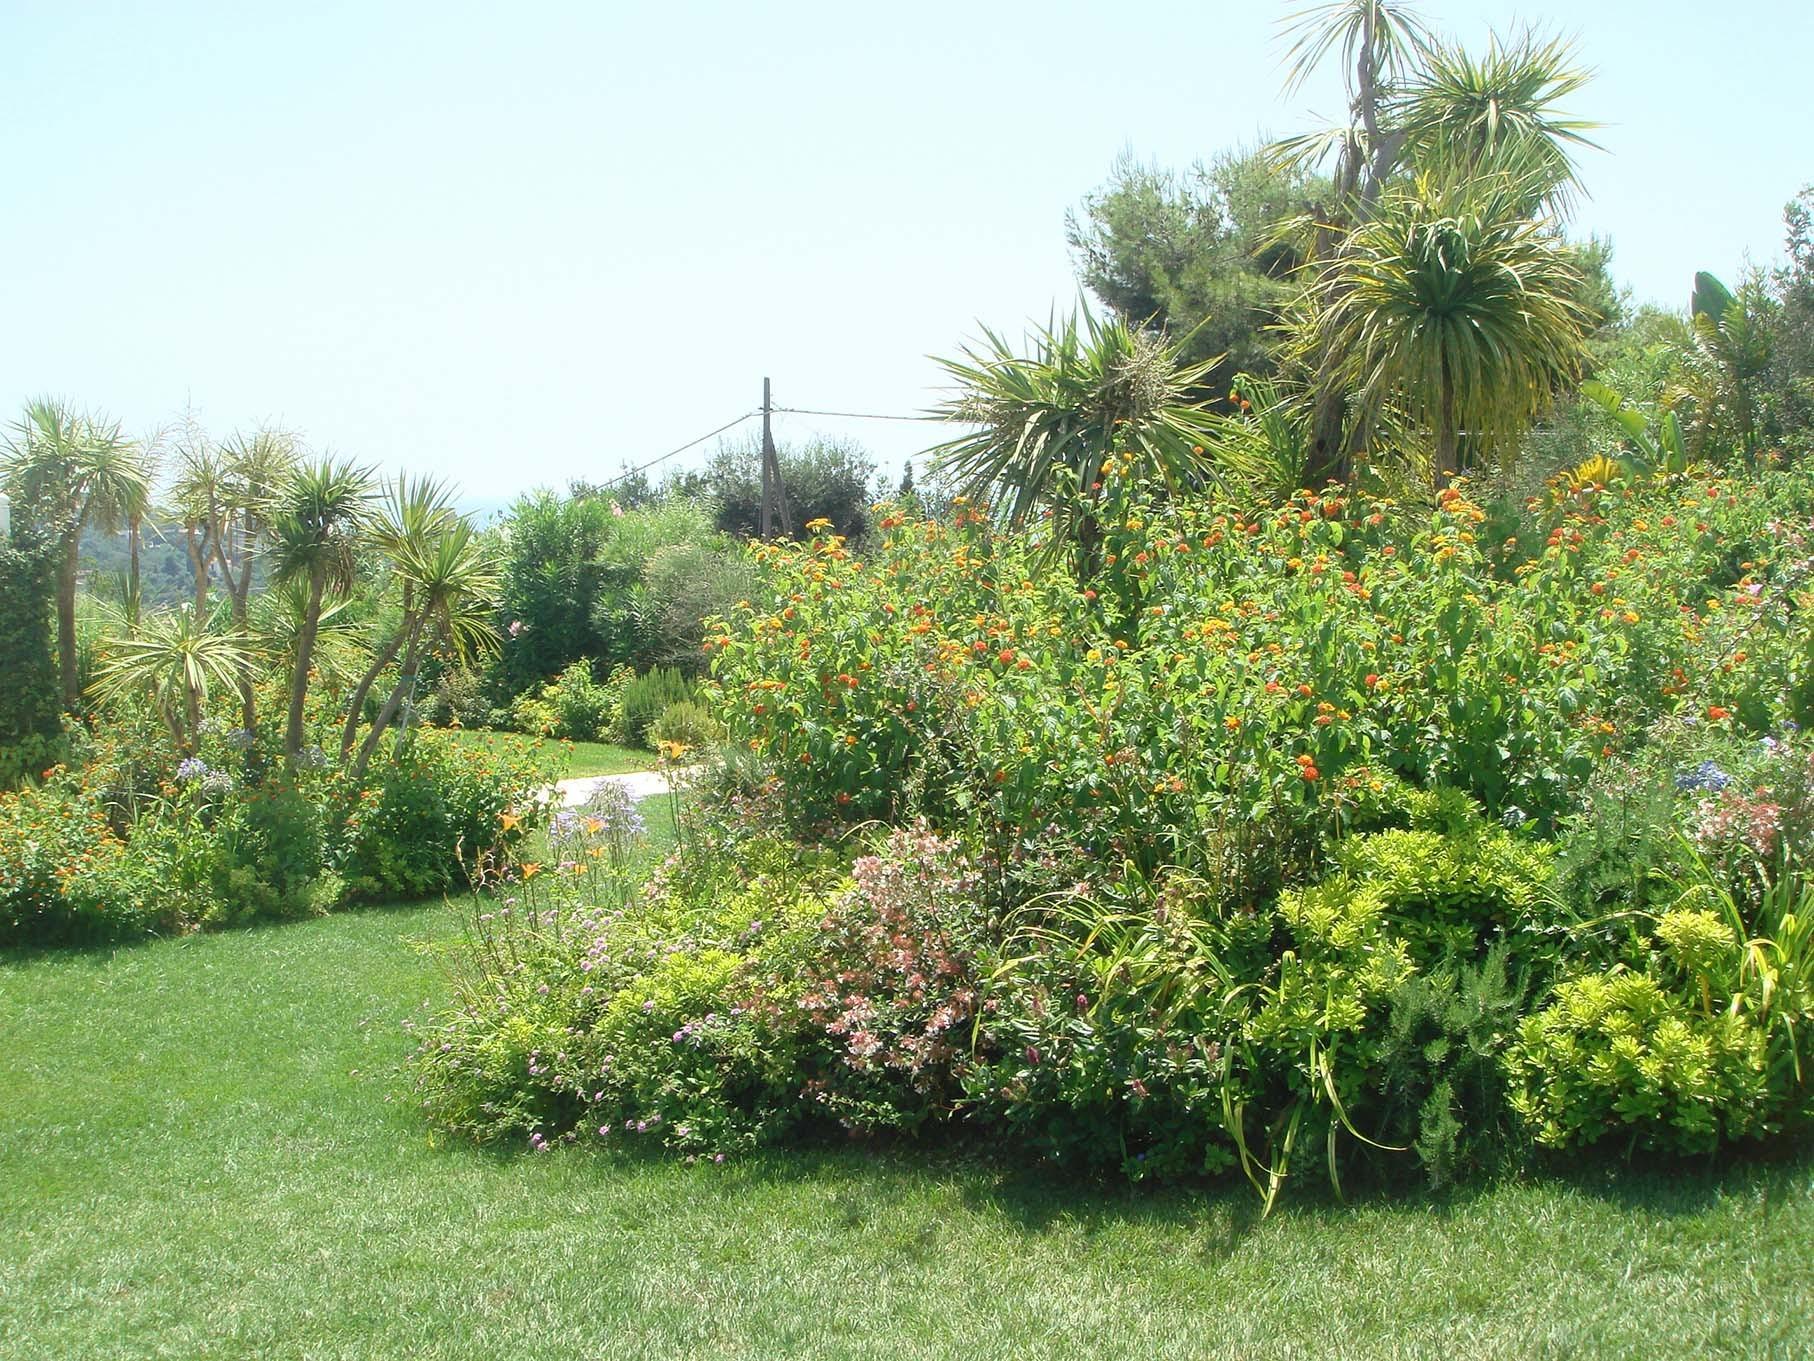 Piccola gemma Mediterranea - Giardini